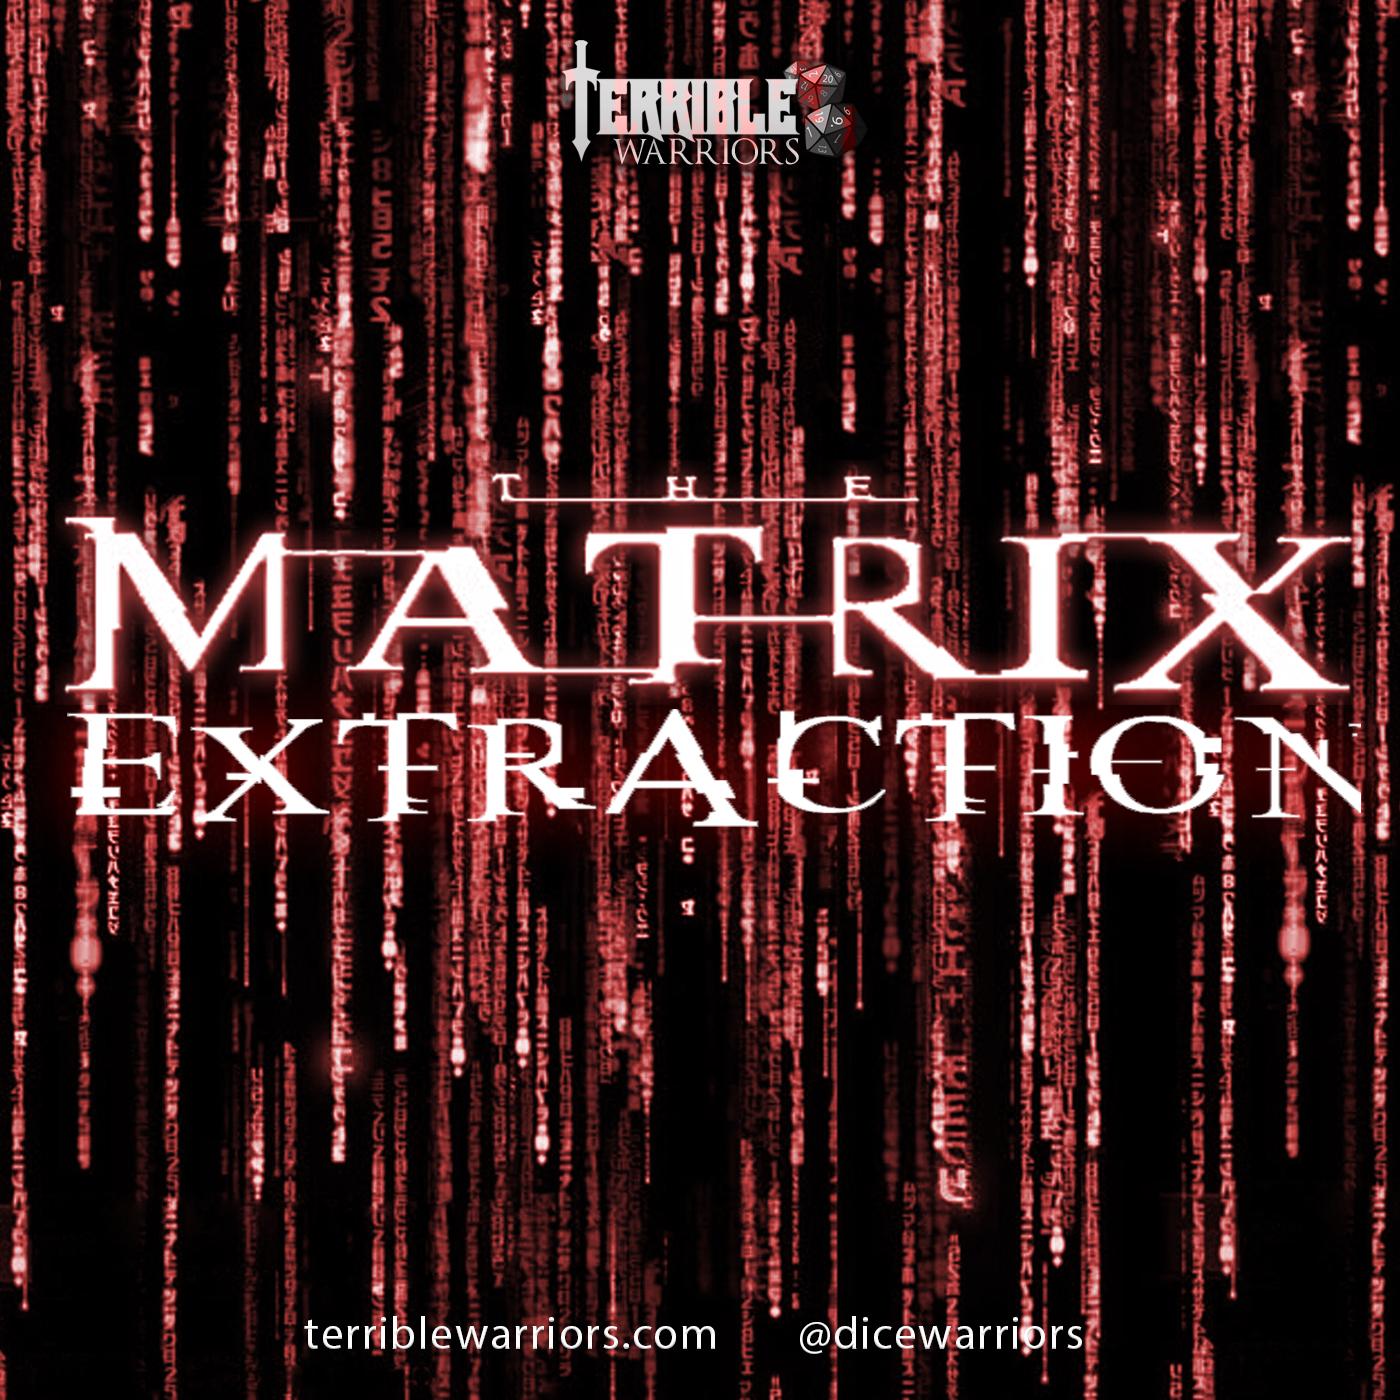 MatrixExtraction-AlbumArt.jpg